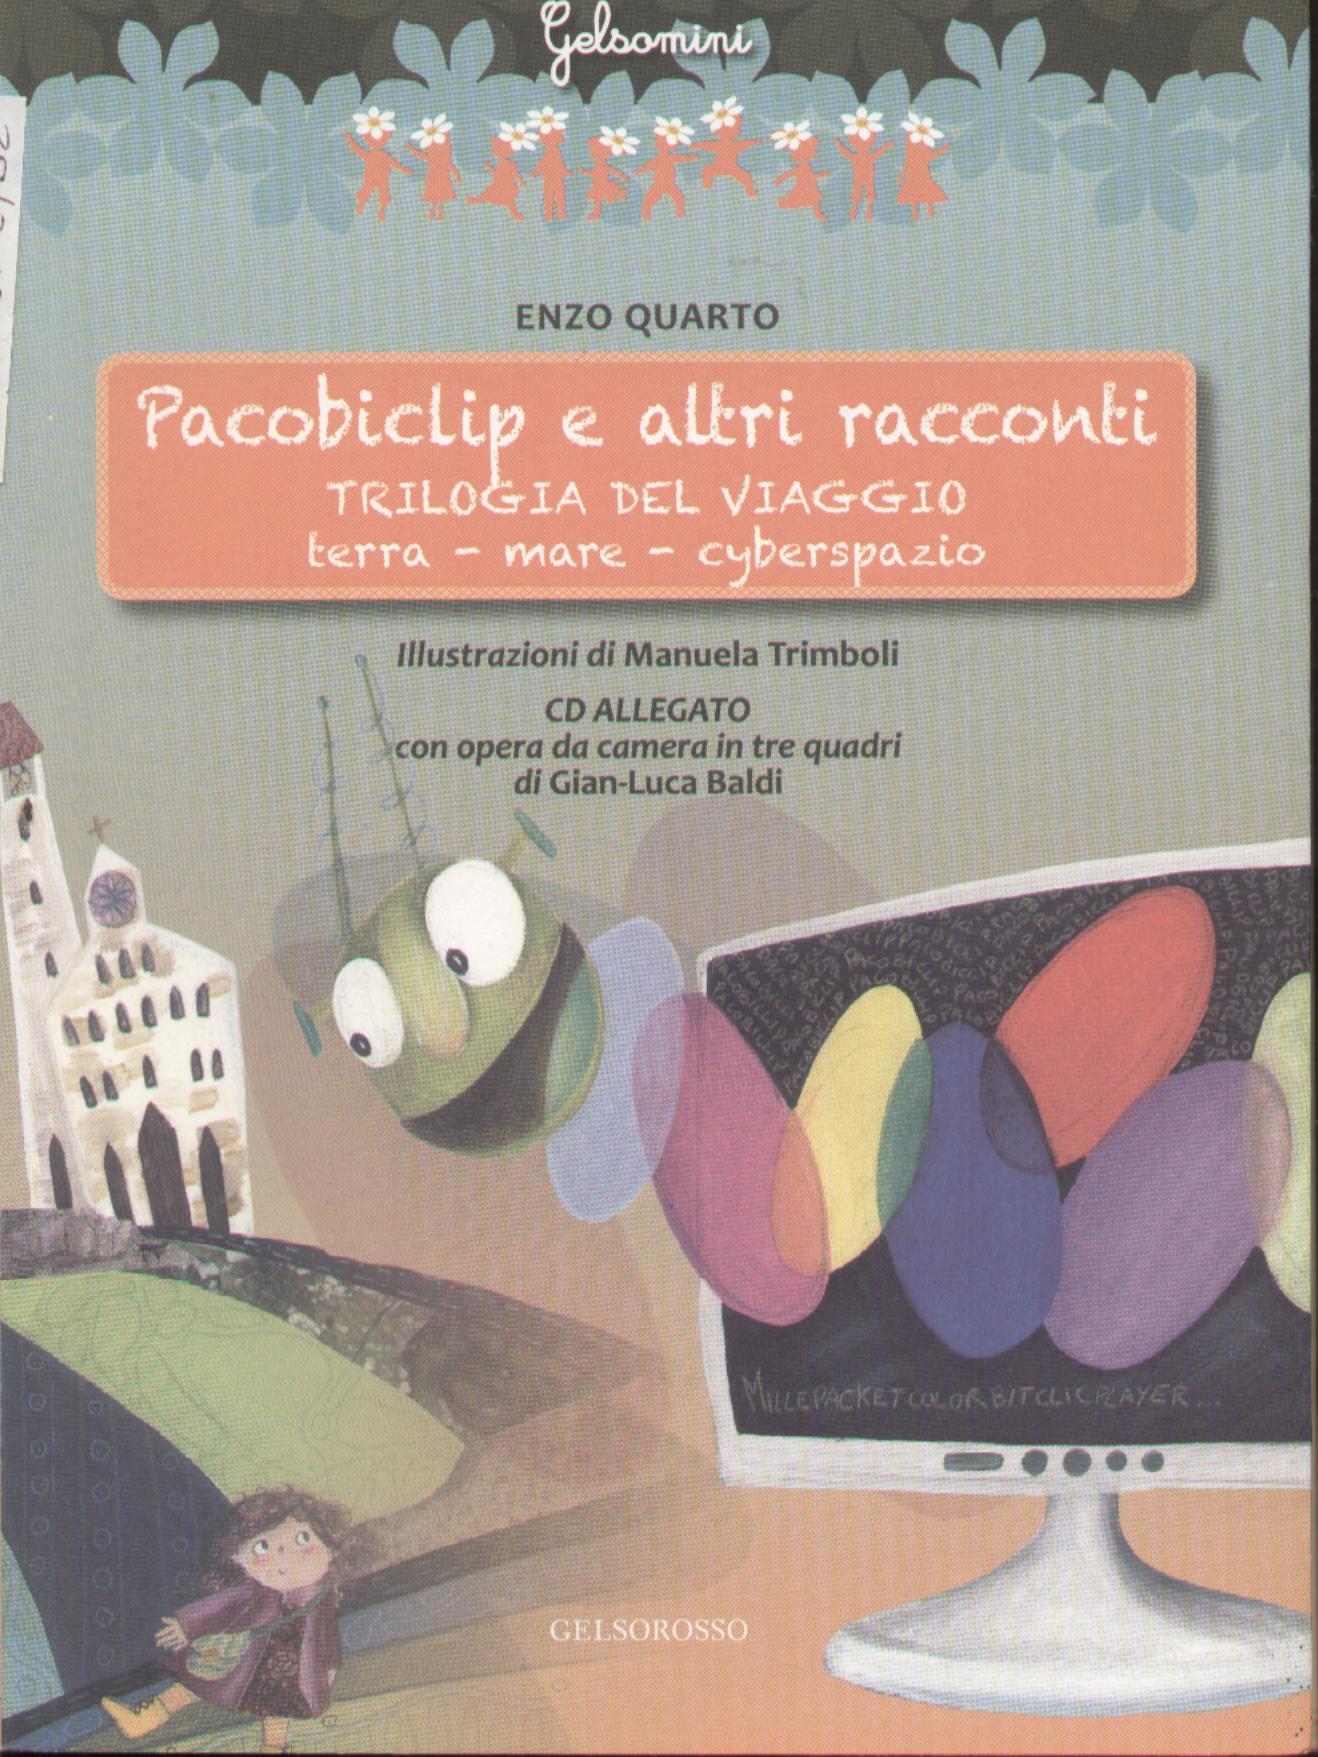 Pacobiclip e altri racconti